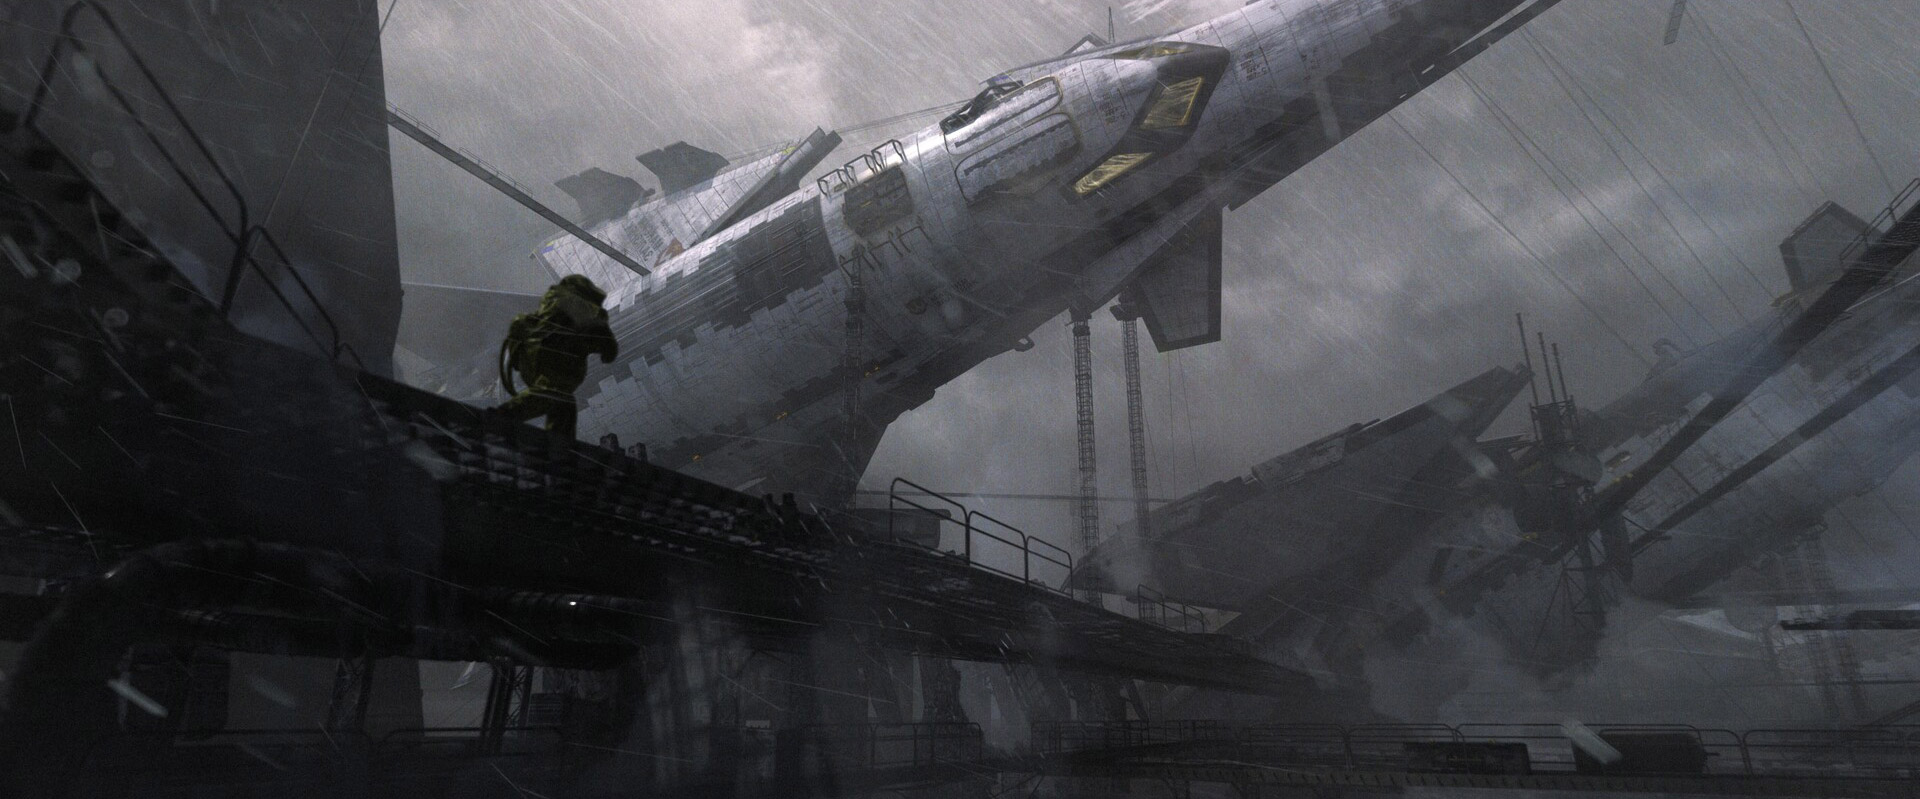 The Science Fiction Art of Oleksiy Rysyuk